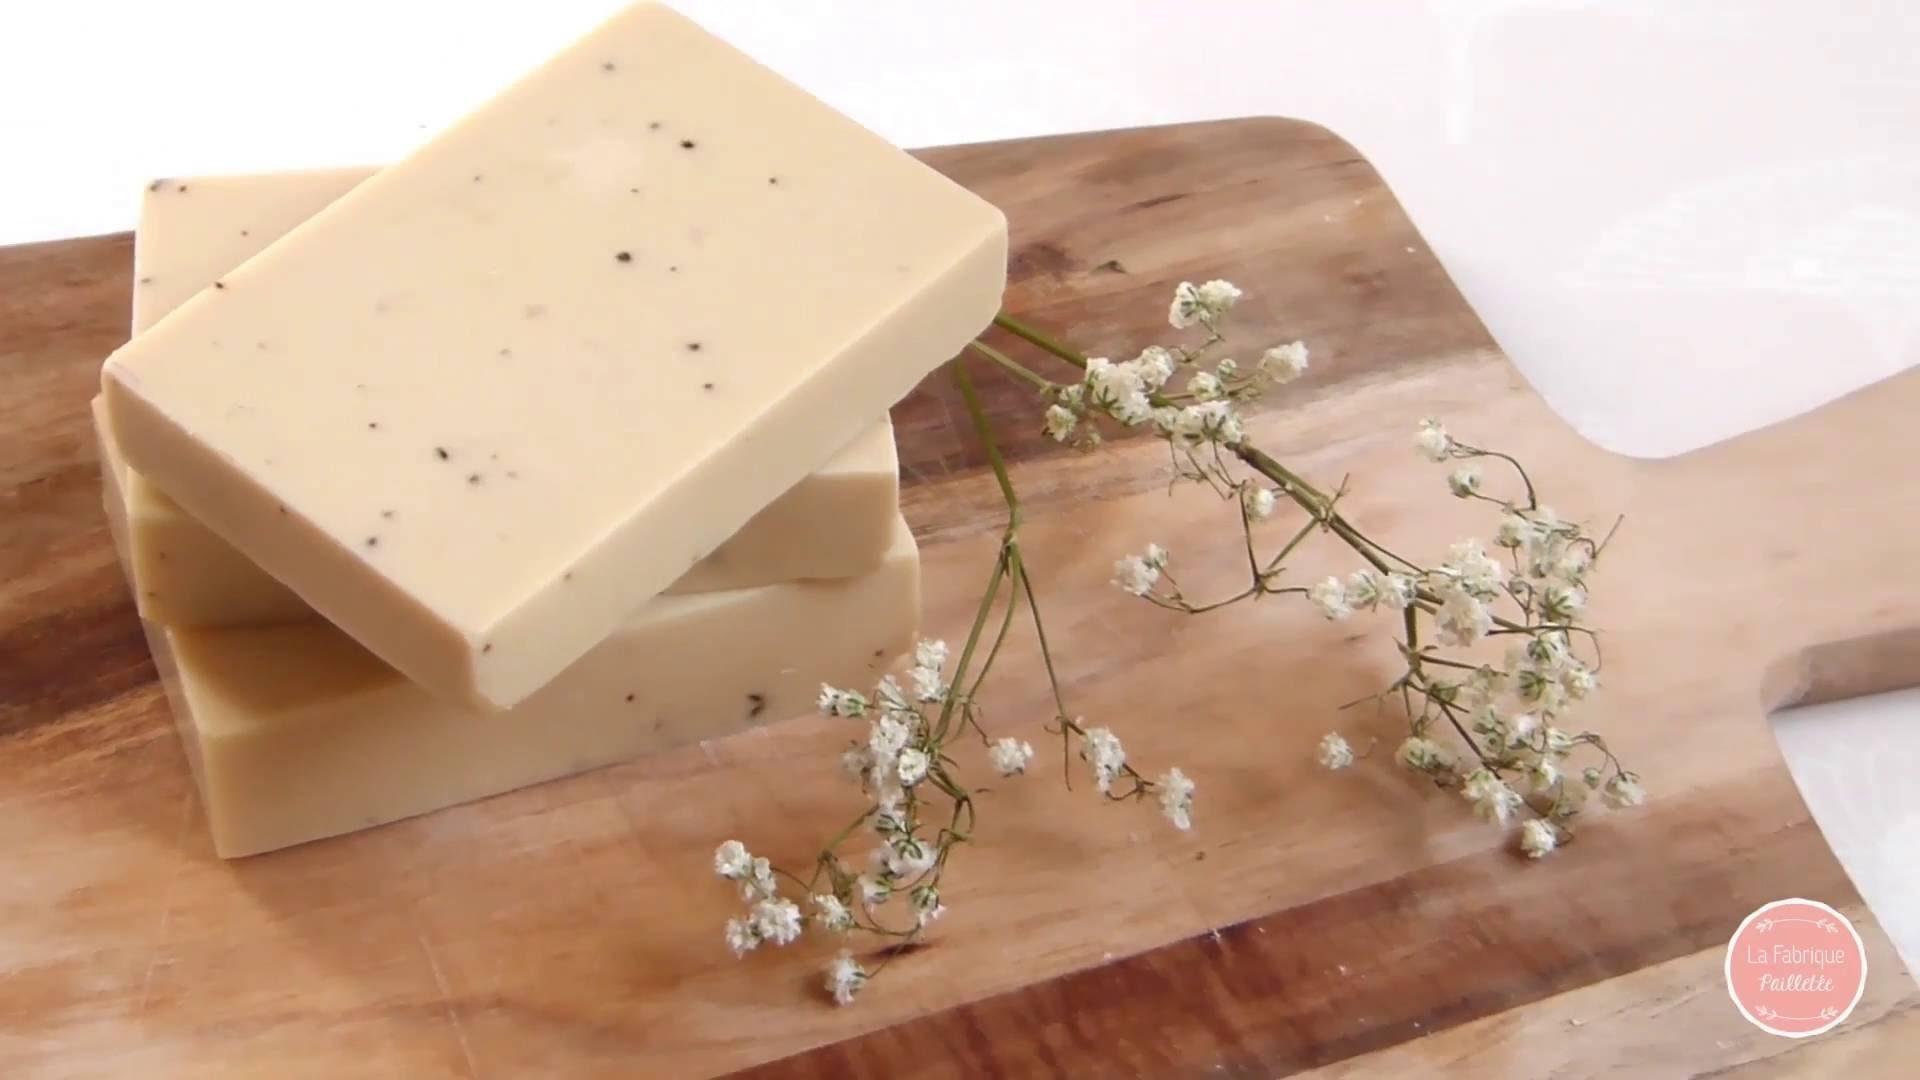 How To Make Natural, Homemade Soap